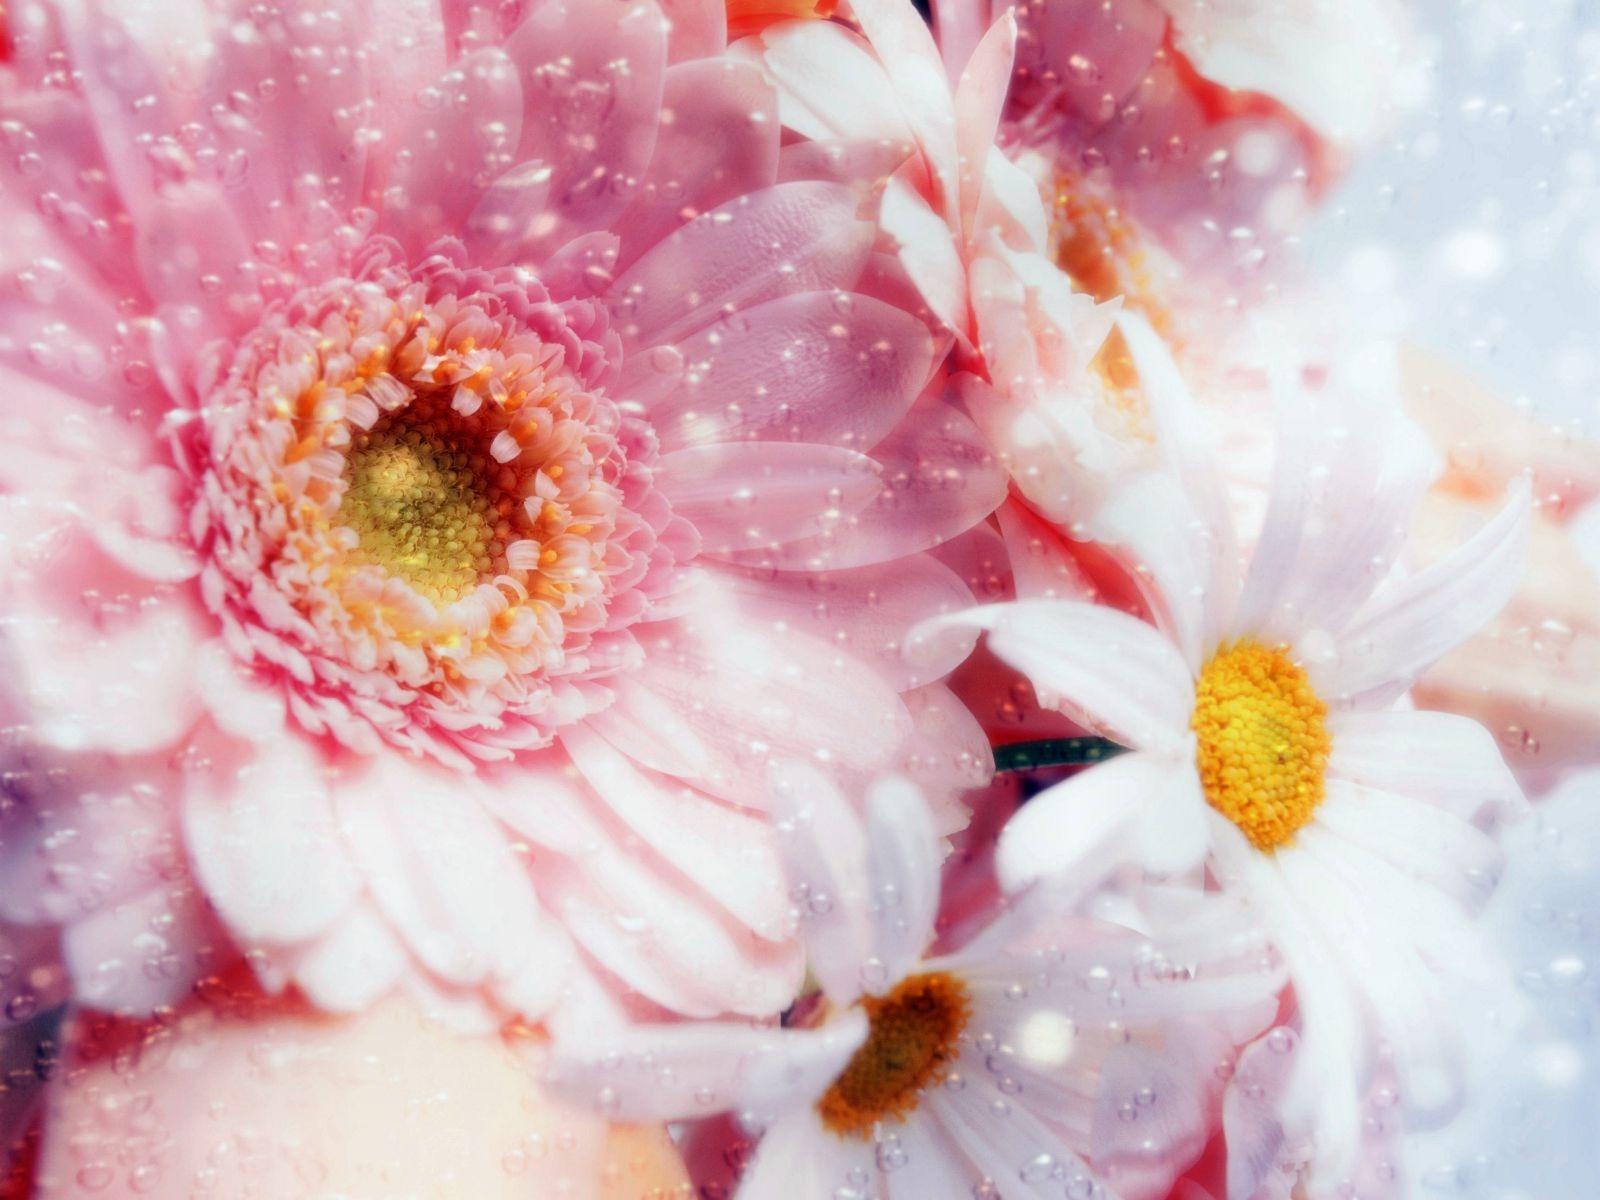 dreams pink flowers wallpaper flowers nature wallpaper 1600 1200 1520 1600x1200